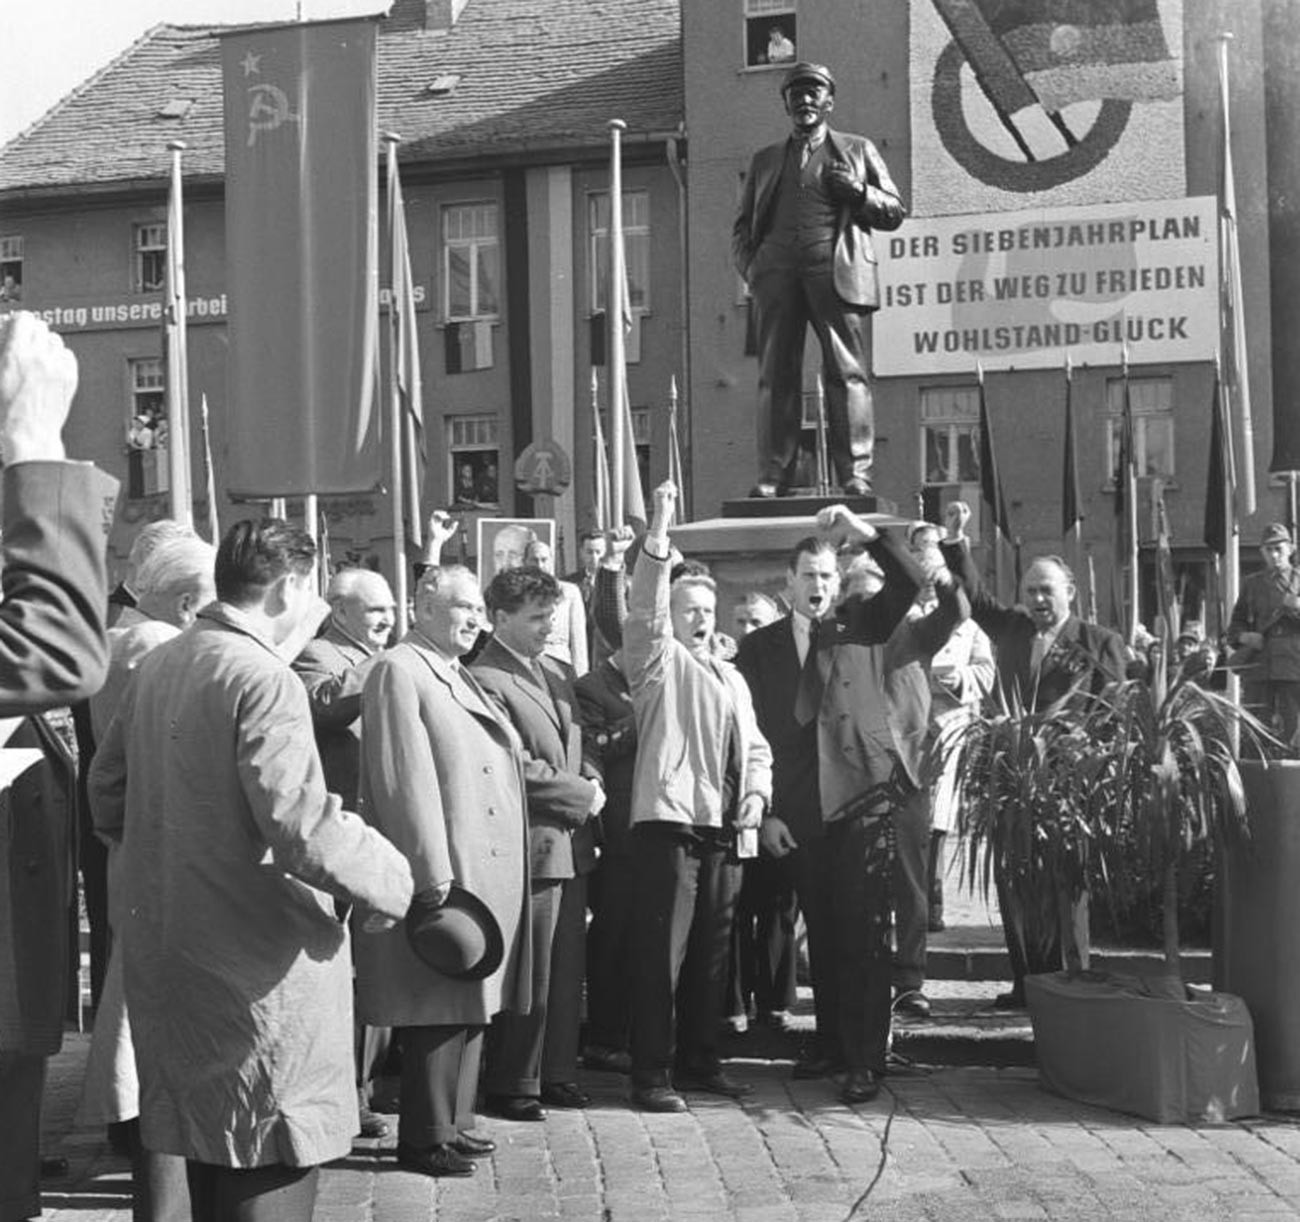 The Soviet delegation in Eisleben, German Democratic Republic, 1959